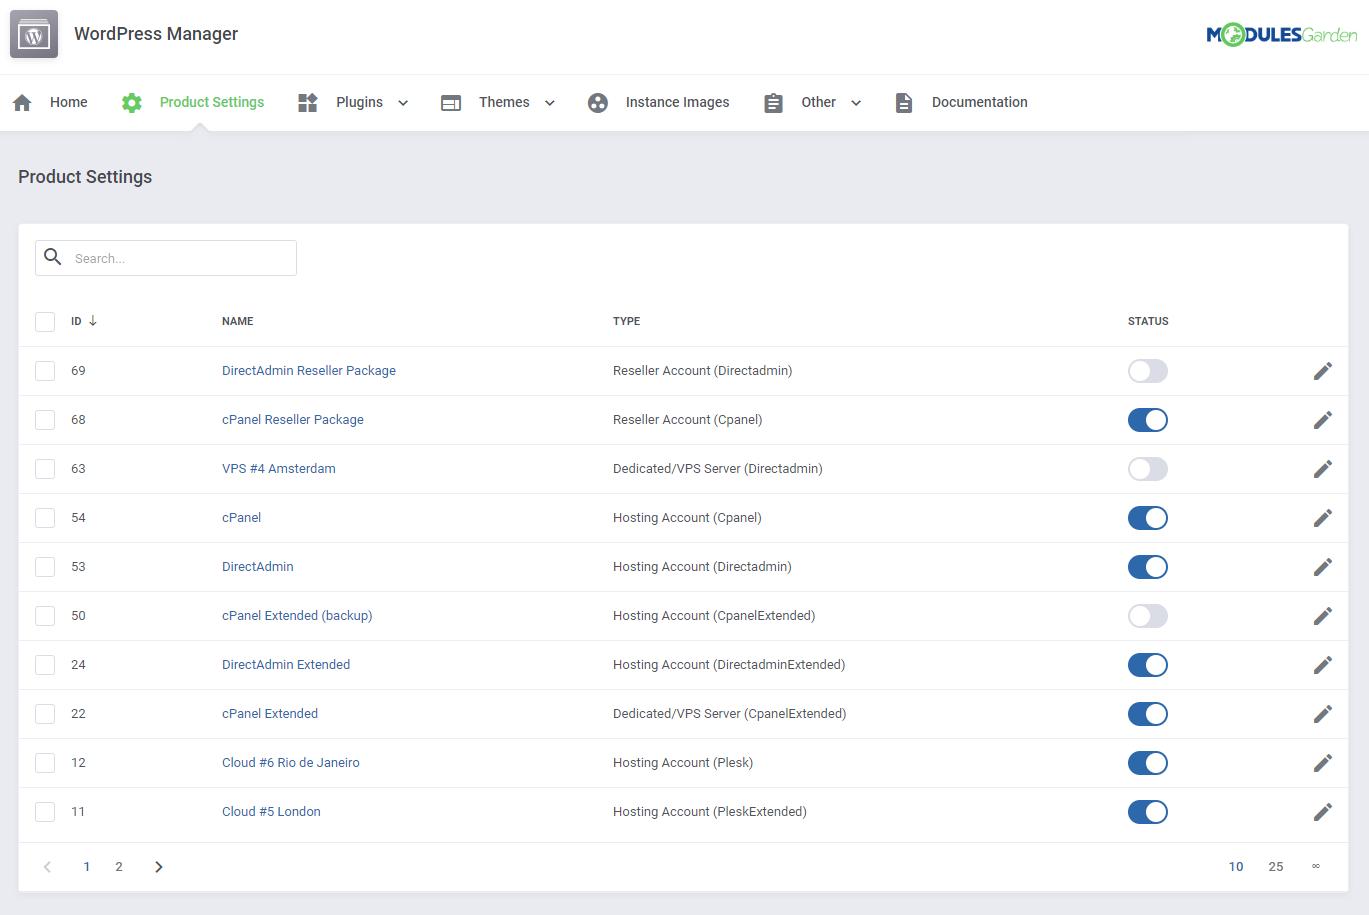 WordPress Manager For WHMCS: Module Screenshot 22